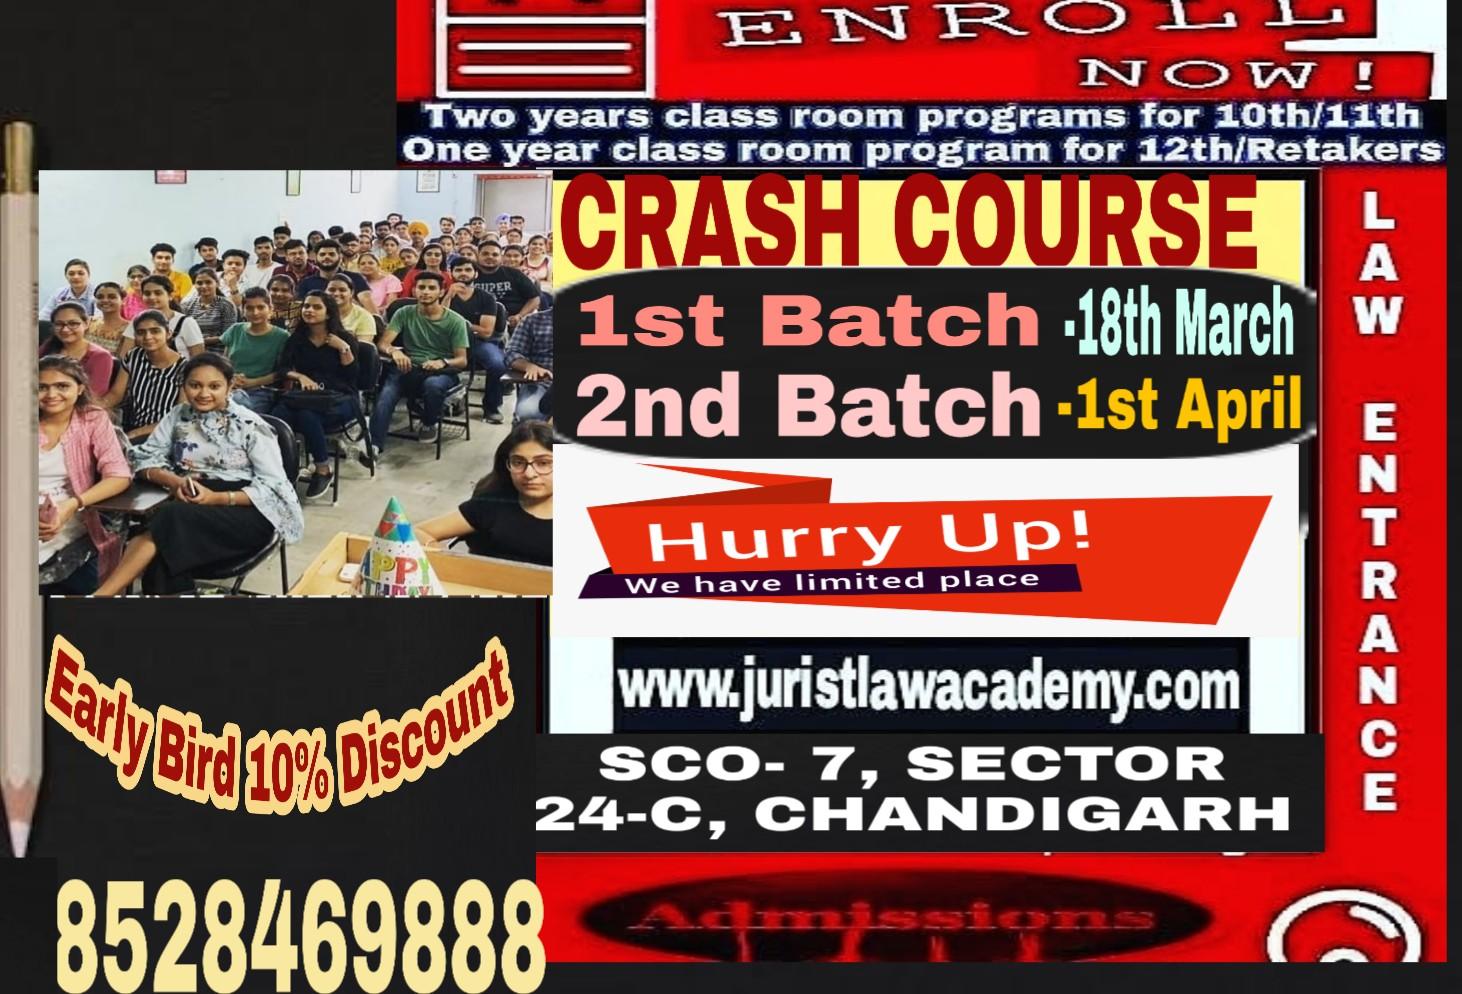 JURIST LAW ACADEMY, clat coaching in Chandigarh, best law entrance coaching in Chandigarh, best clat coaching institute in Chandigarh, best clat coaching in Chandigarh, best clat exam coaching in Chandigarh, best clat